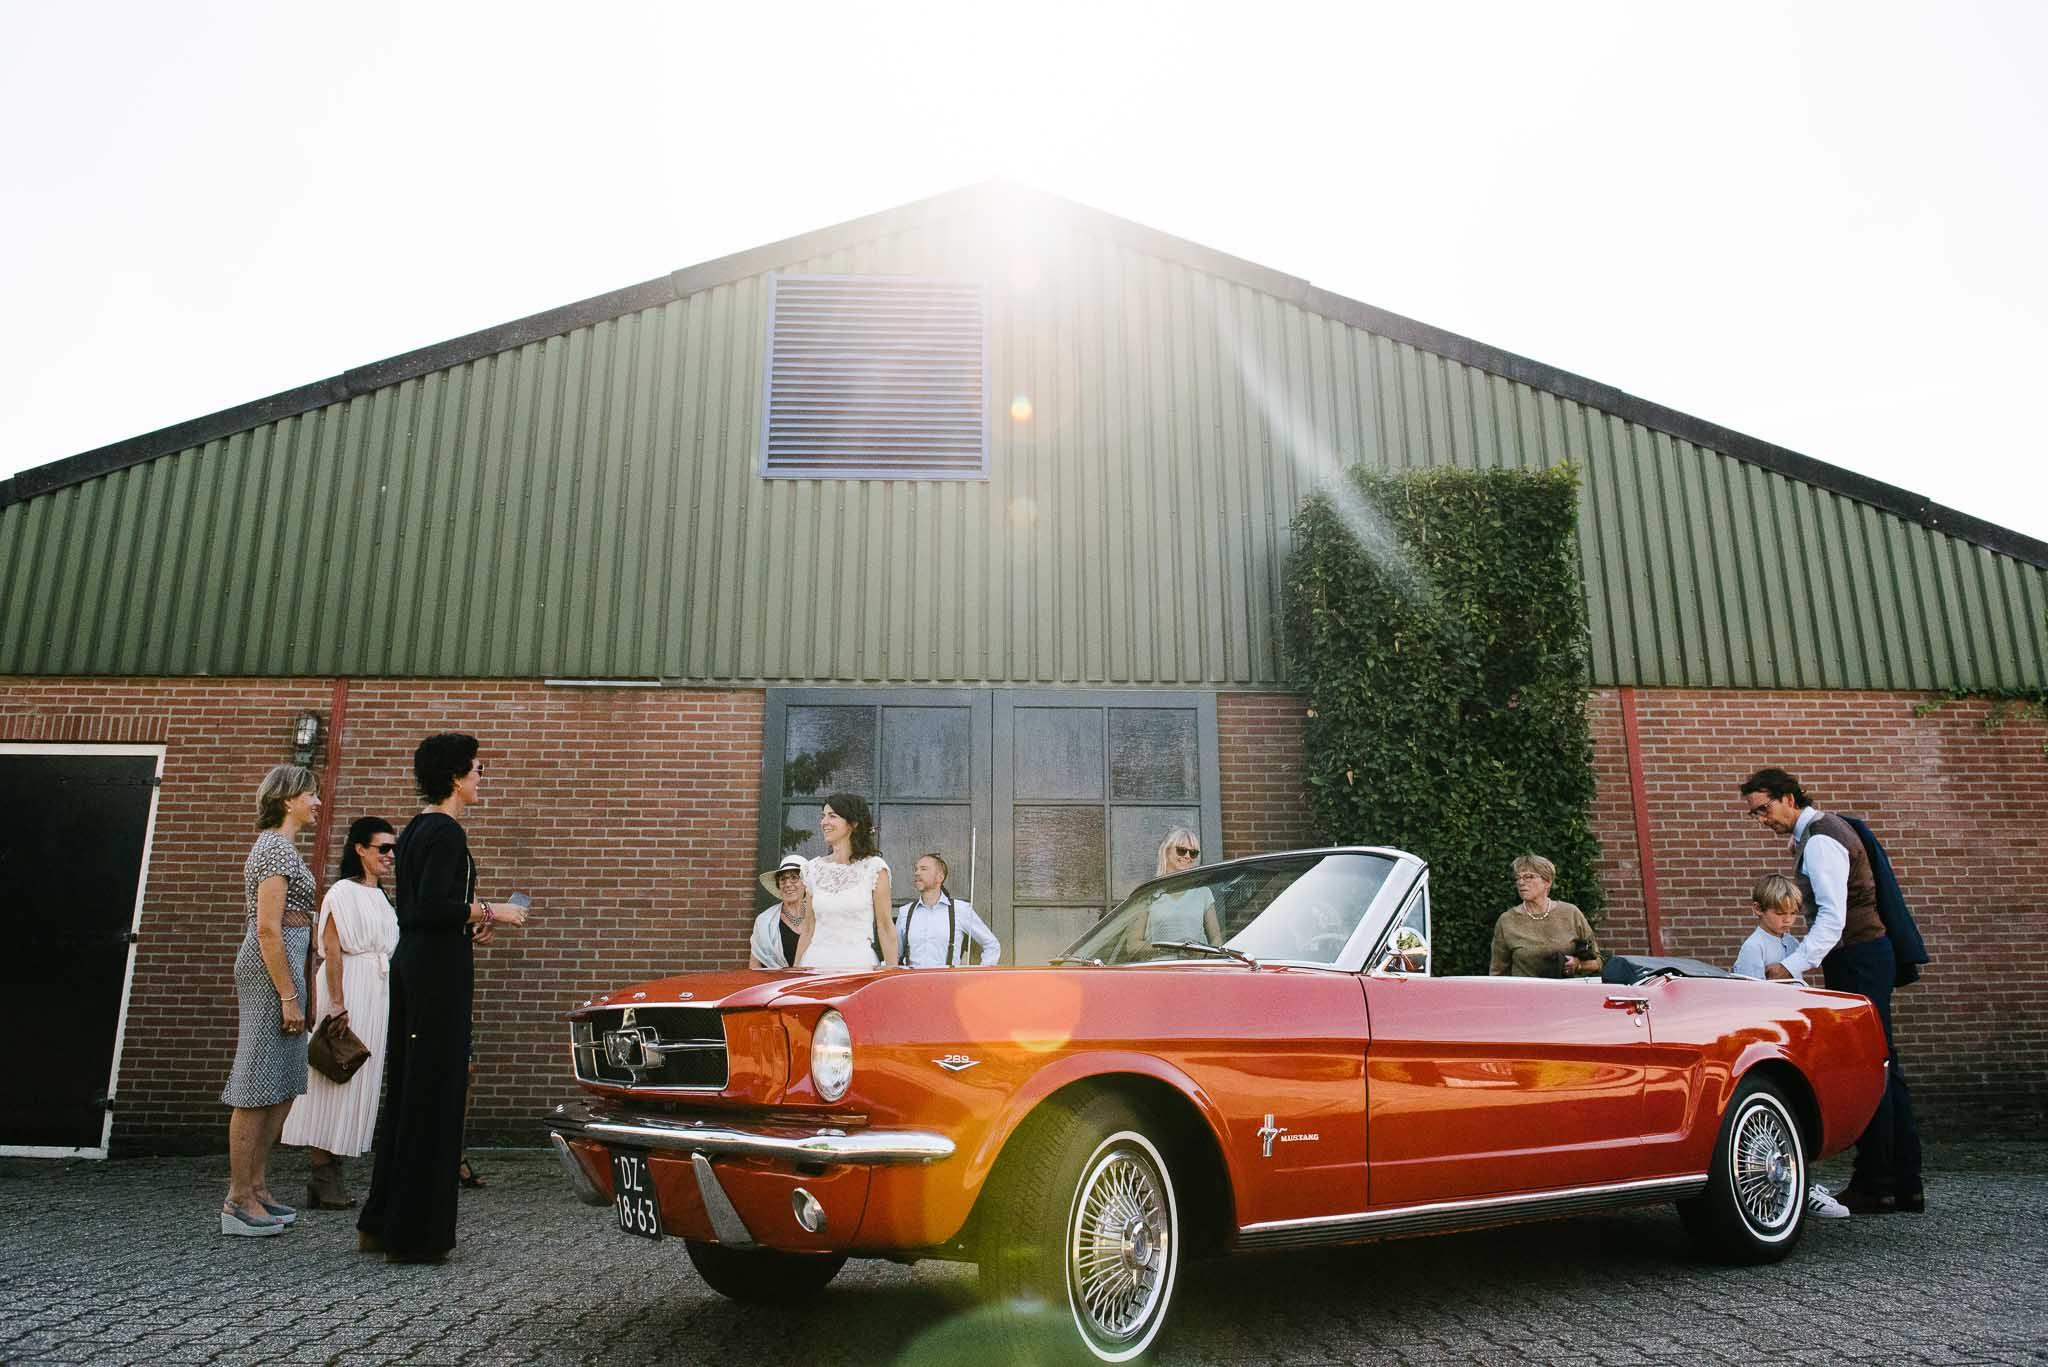 journalistieke bruidsfotografie Arnhem rode Ford Mustang trouwauto